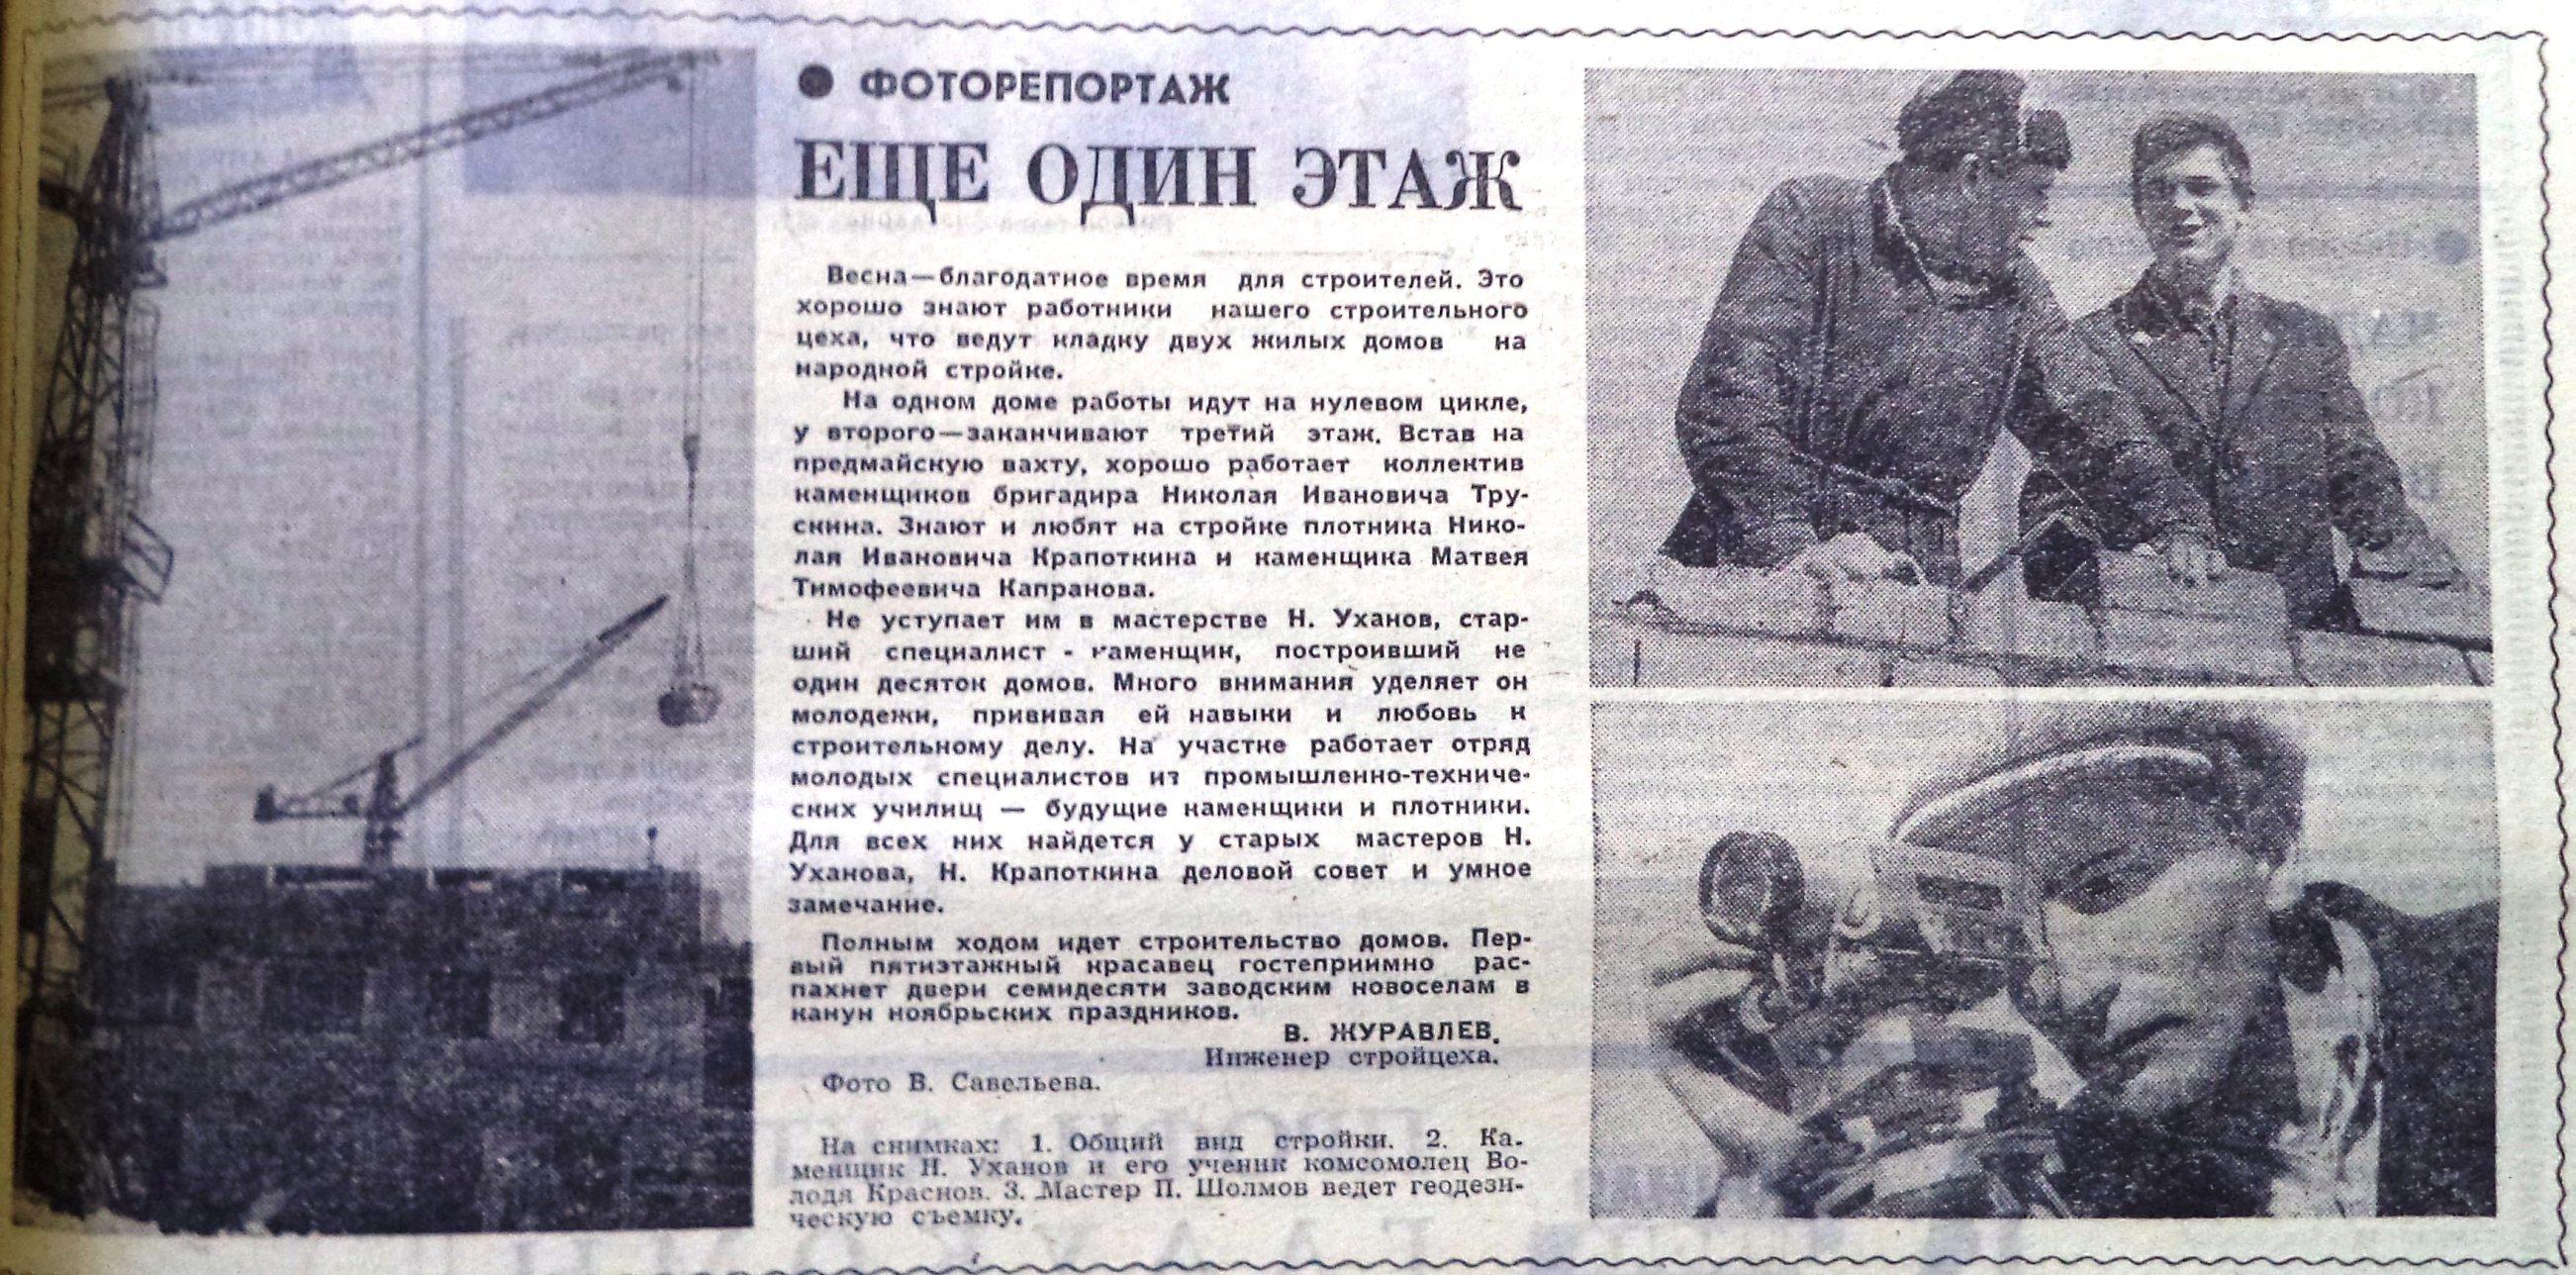 Средне-Садовая-ФОТО-37-застройка 9 ГПЗ в 1968 году-min